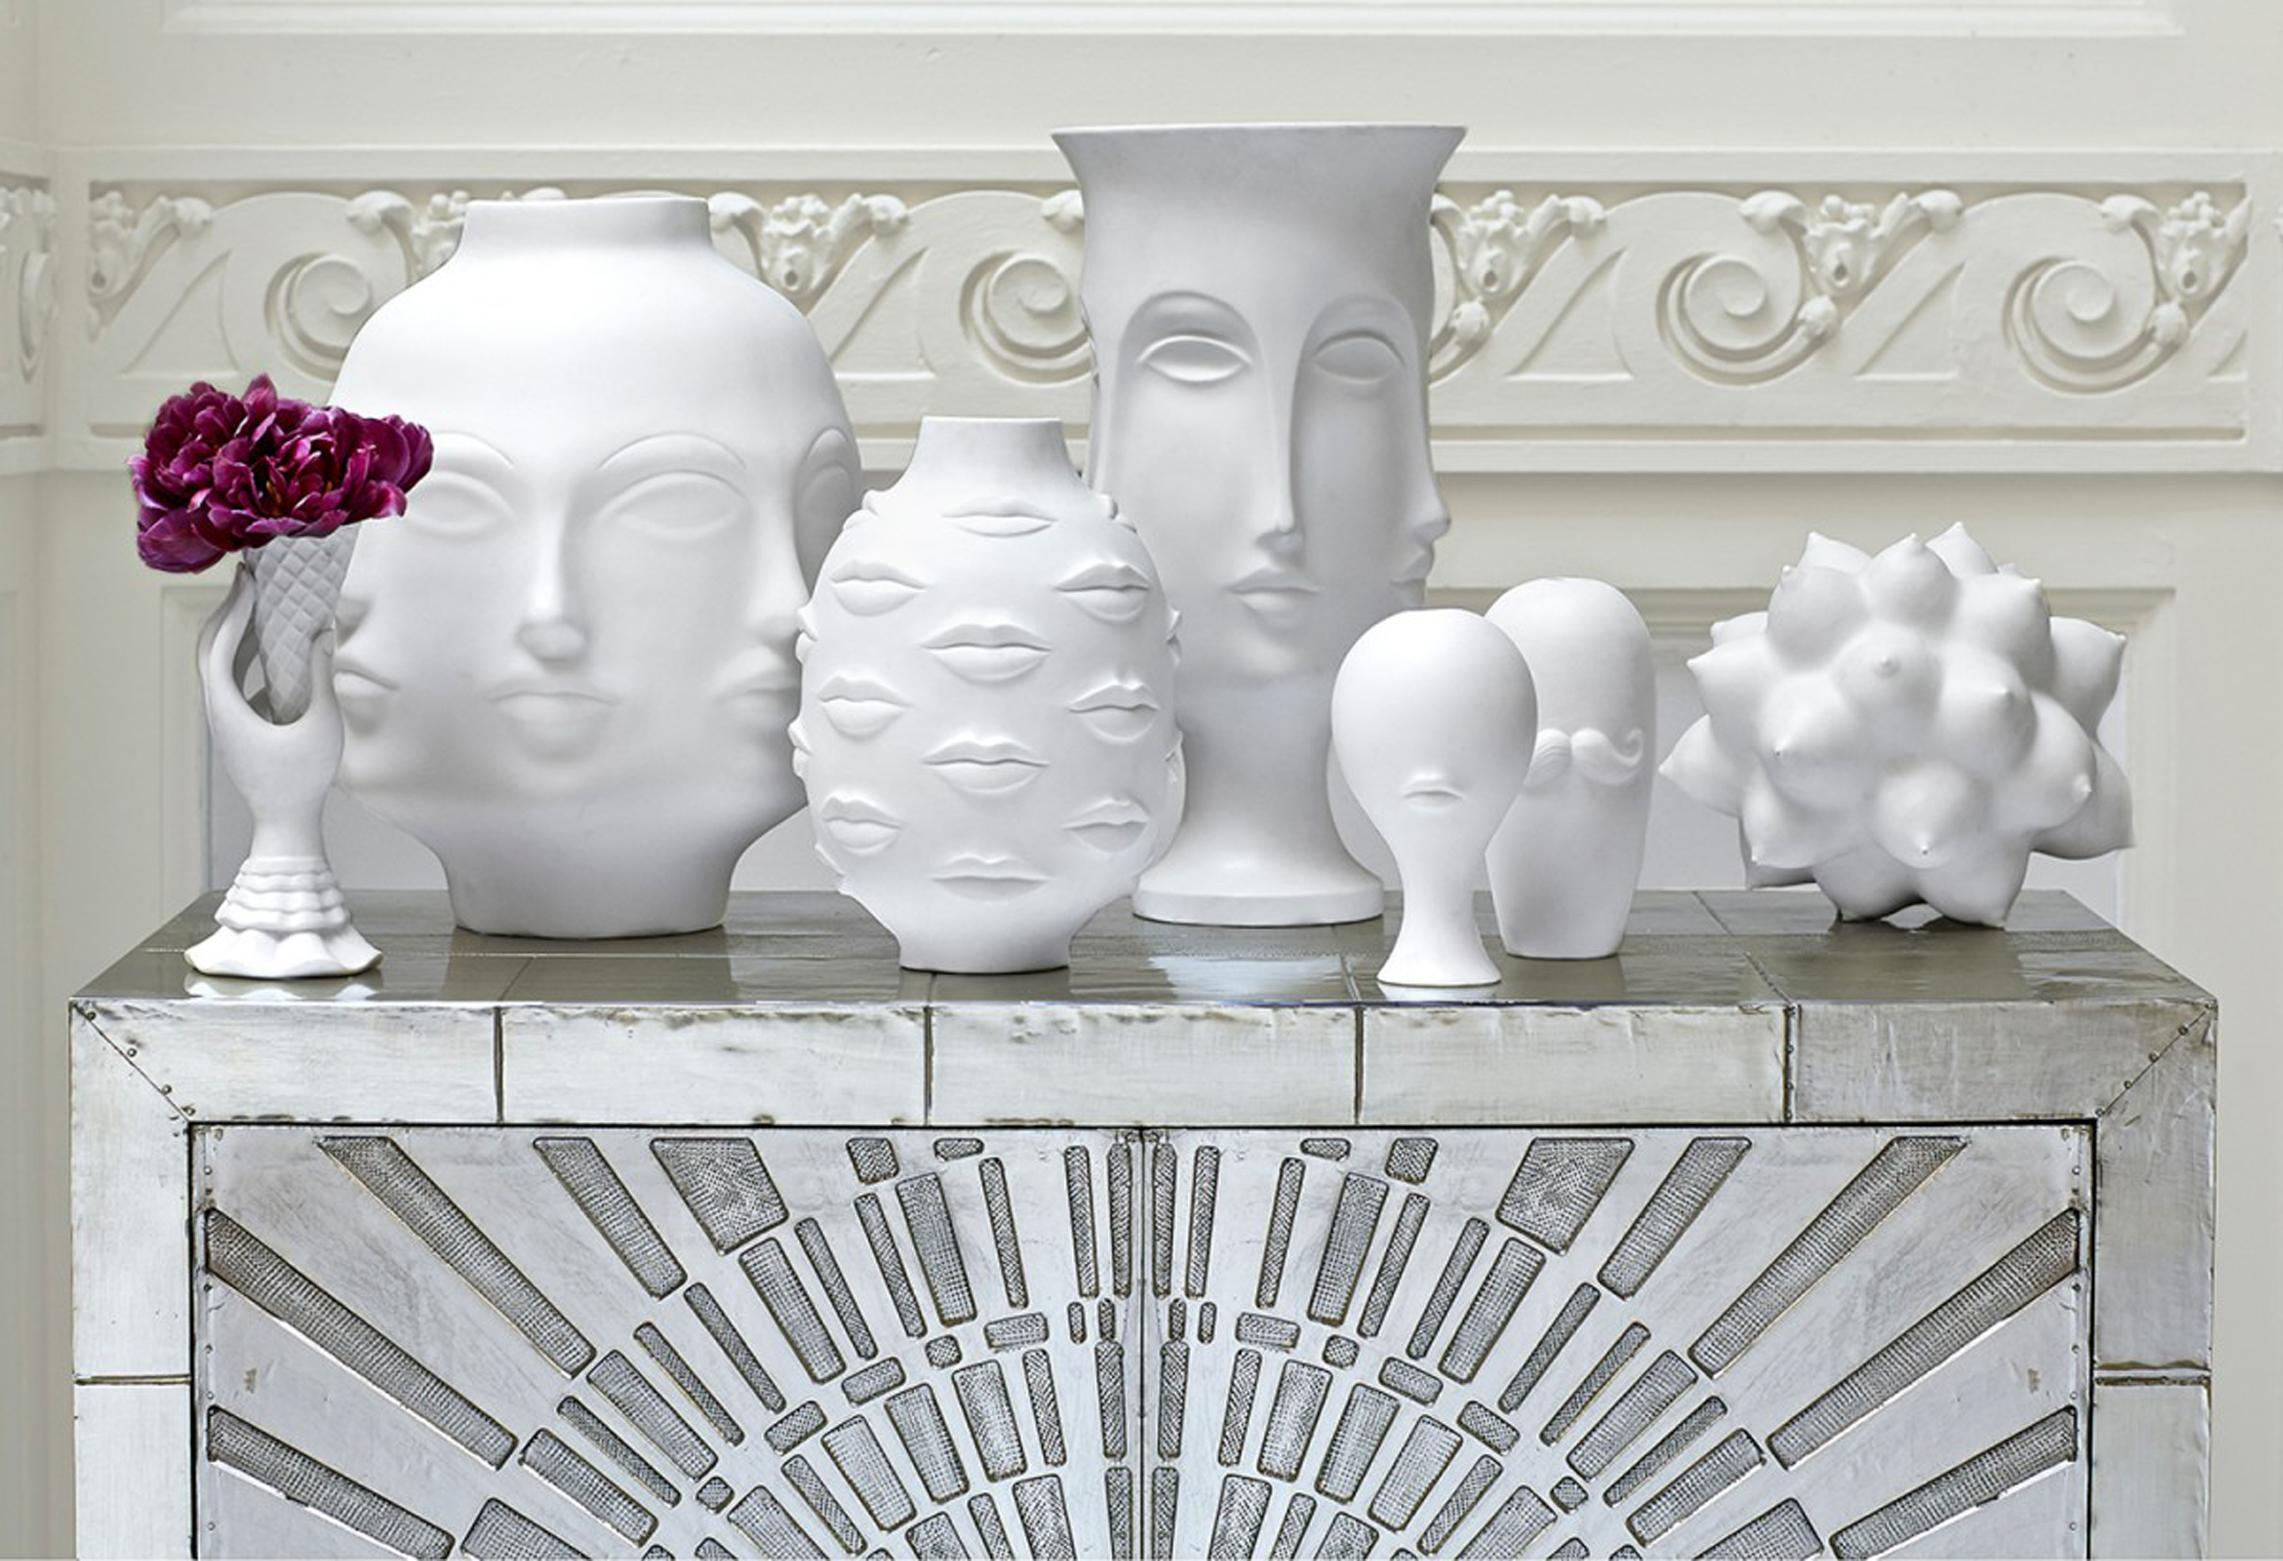 Vases|ceramics|belfast|ireland